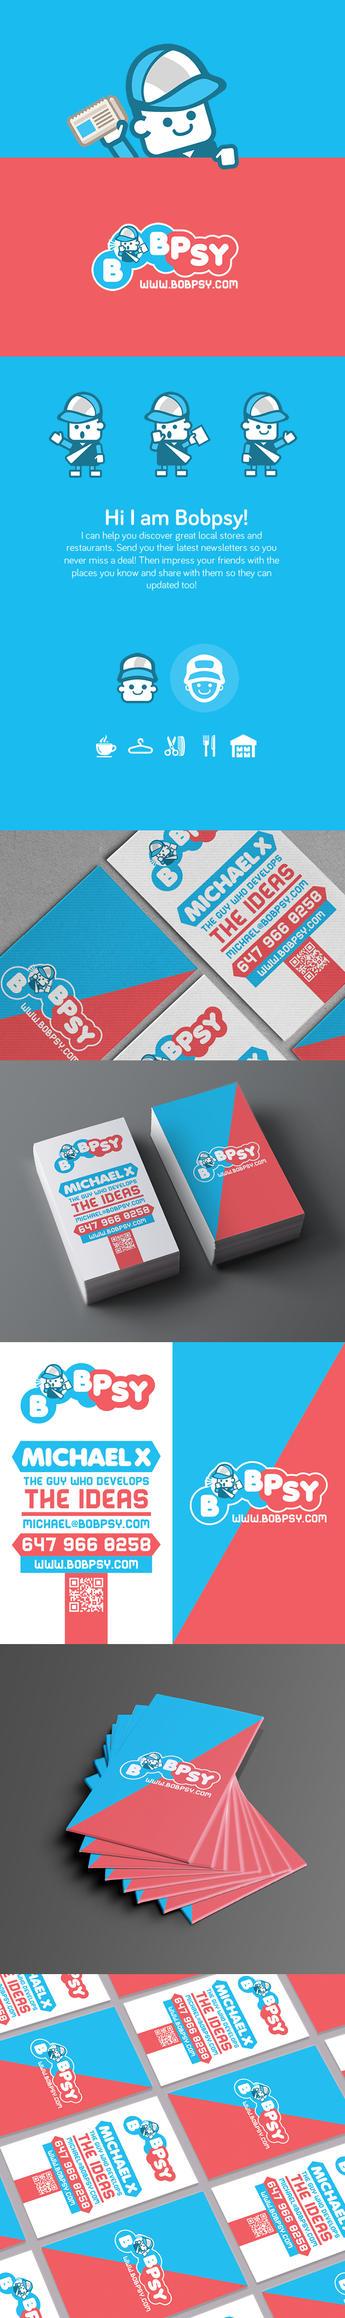 Bobpsy-logo-business-card-design by Lemongraphic